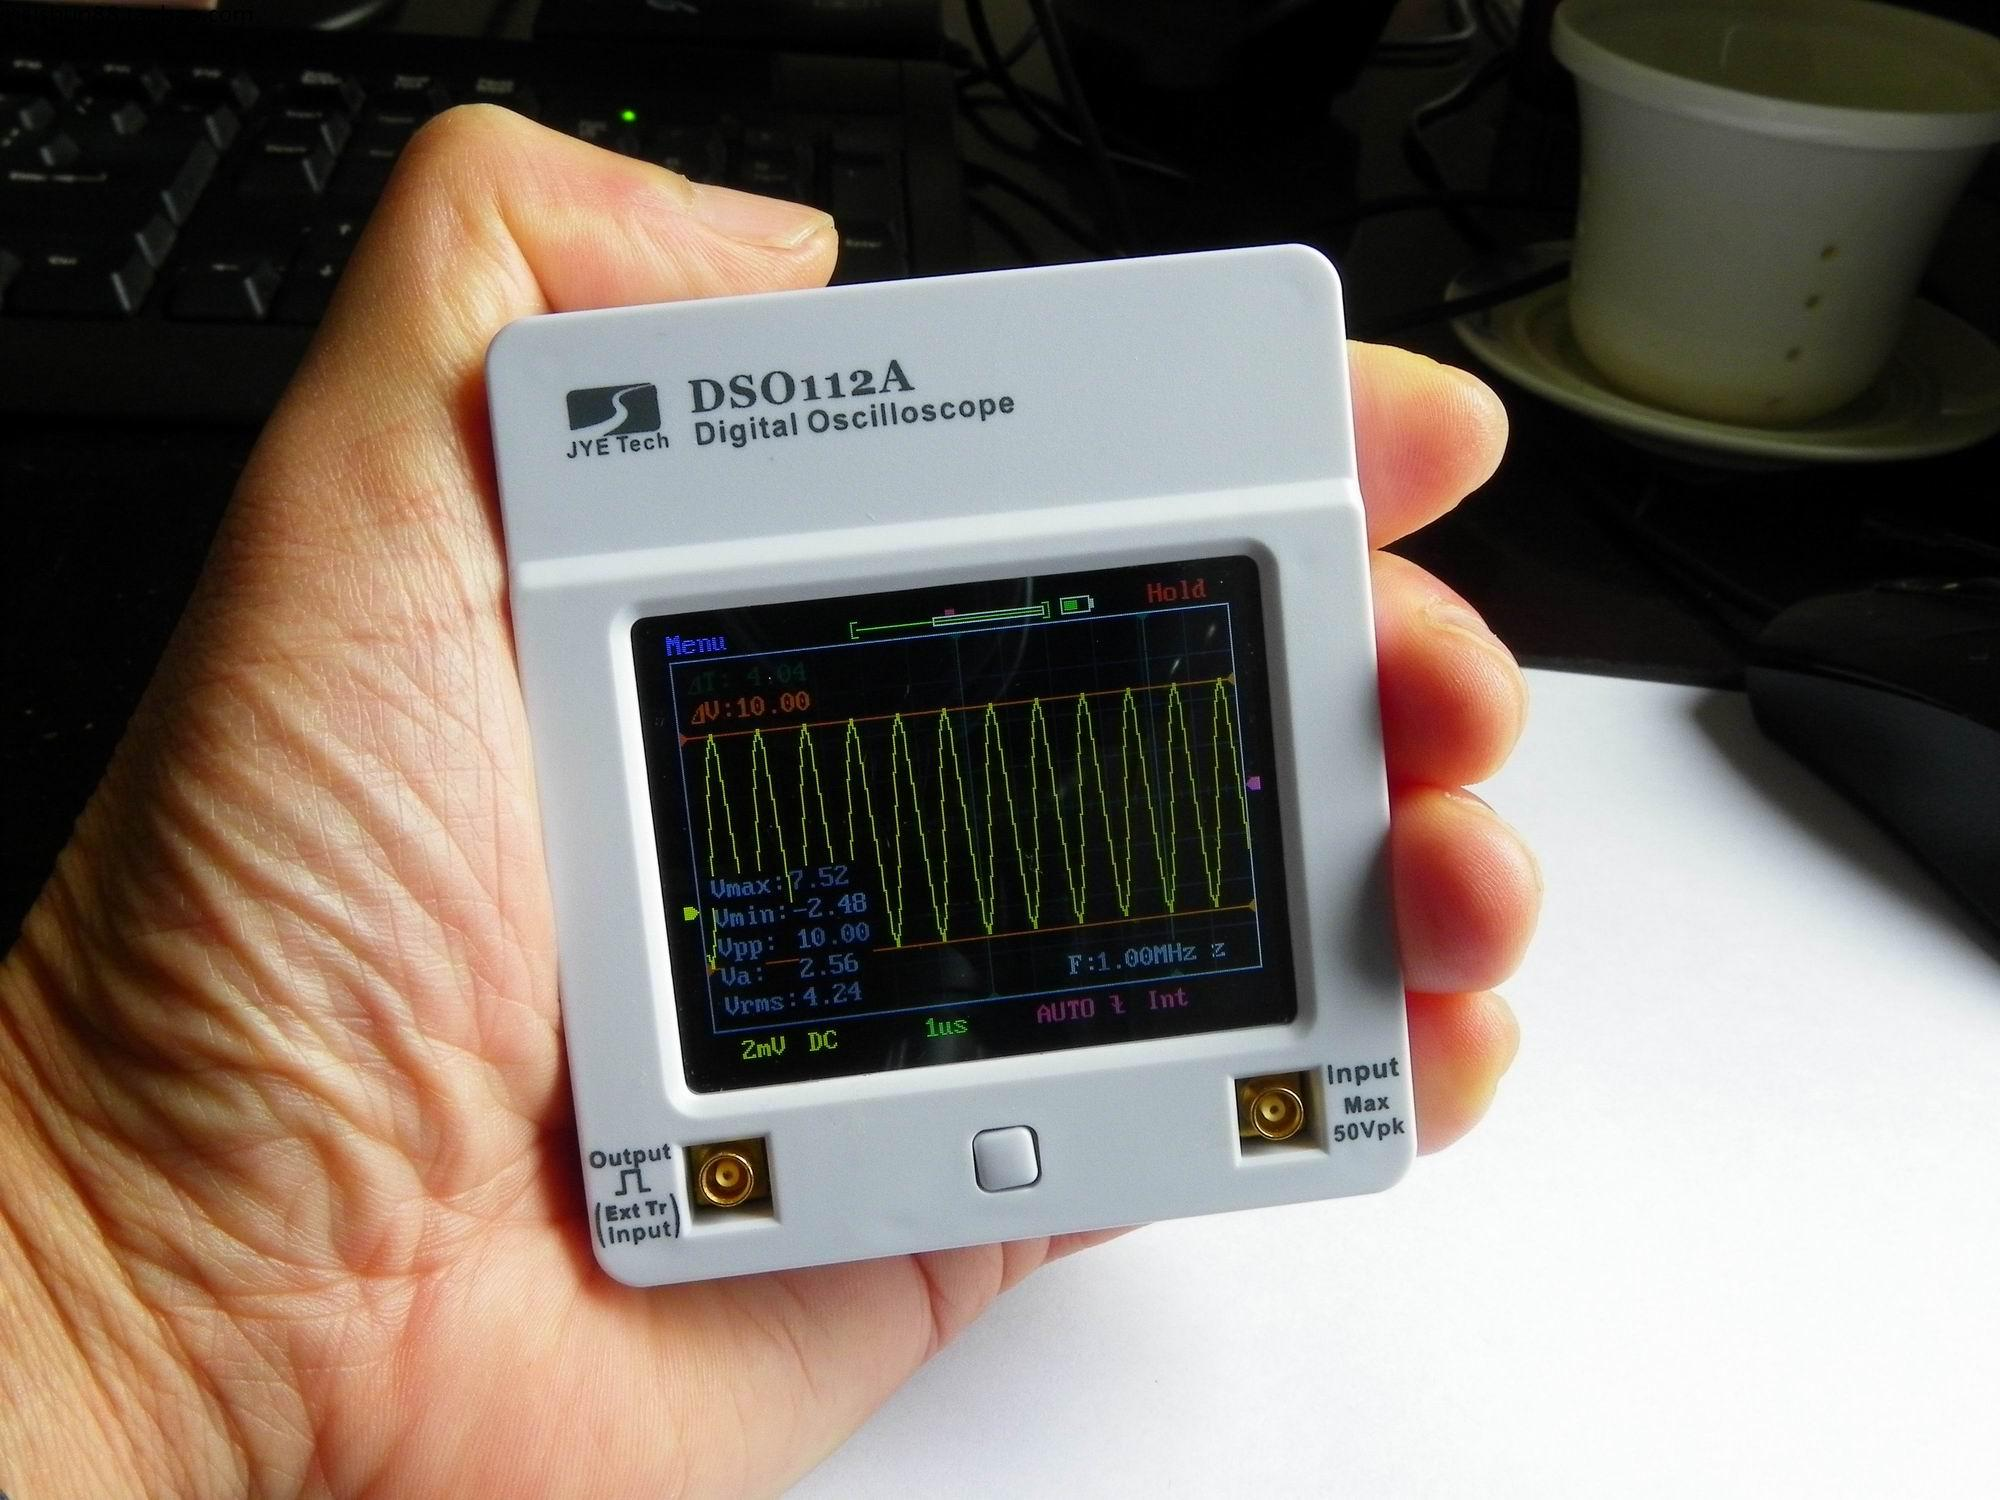 Osciloscopio DSO 112A TFT Touch Screen Tragbare Mini Digital Oszilloskop USB Interface 2 MHz 5 Msps oscyloskopy osciloscop